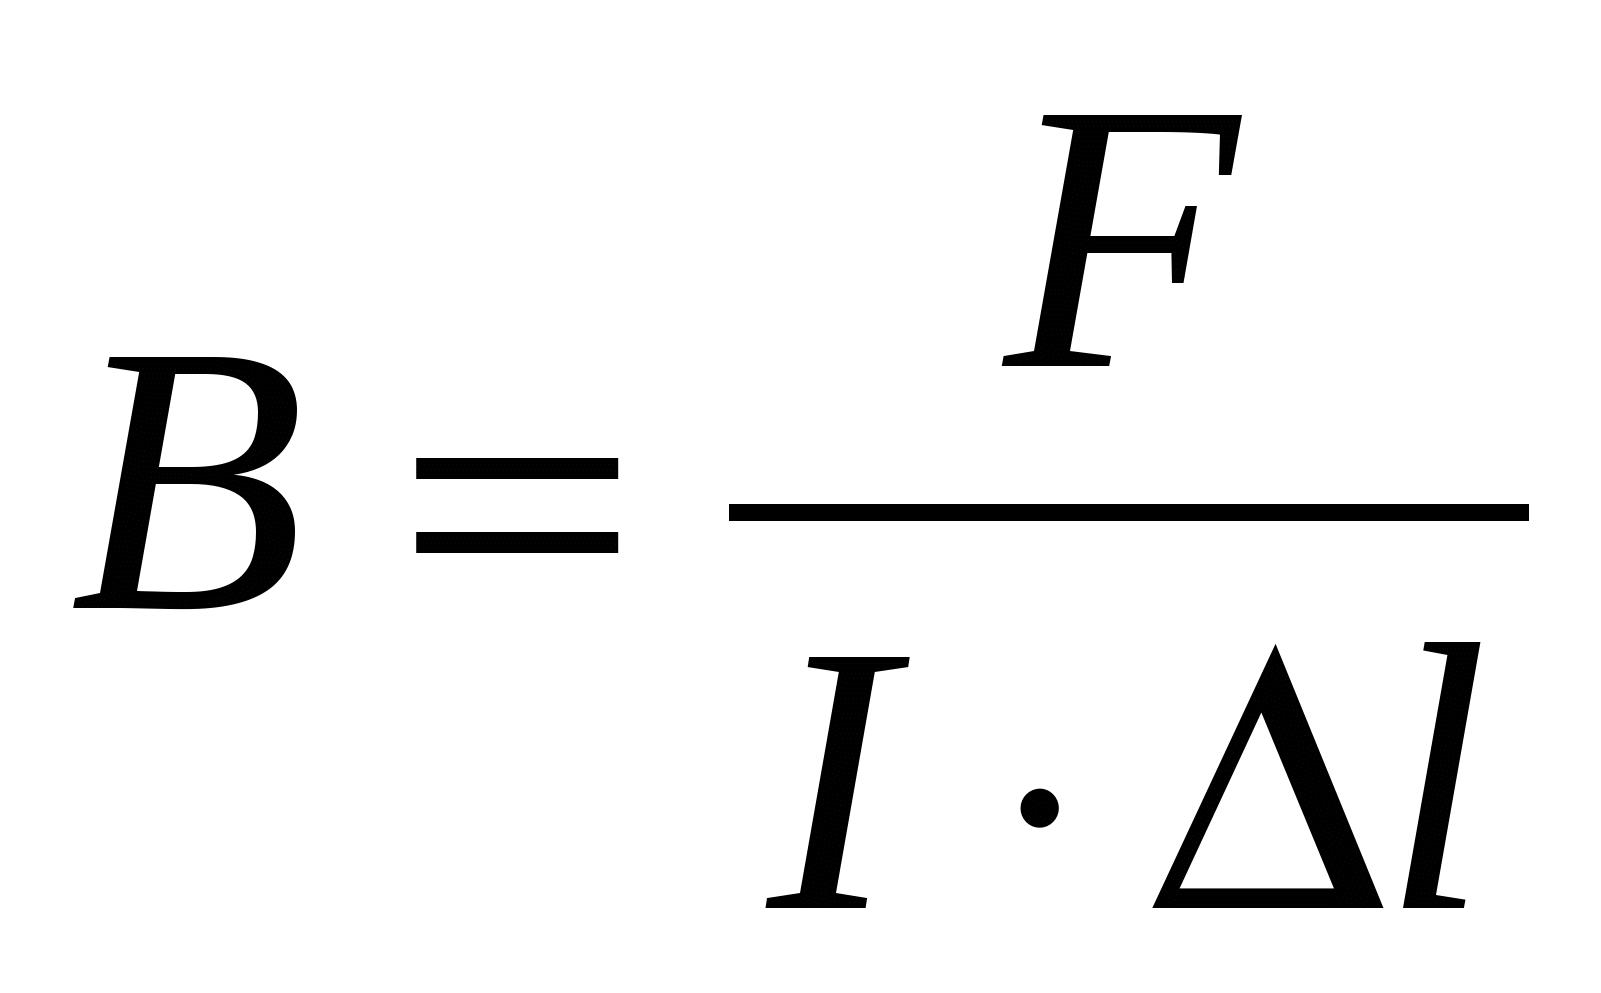 Физика (11 класс)/магнитное поле. магнитная индукция